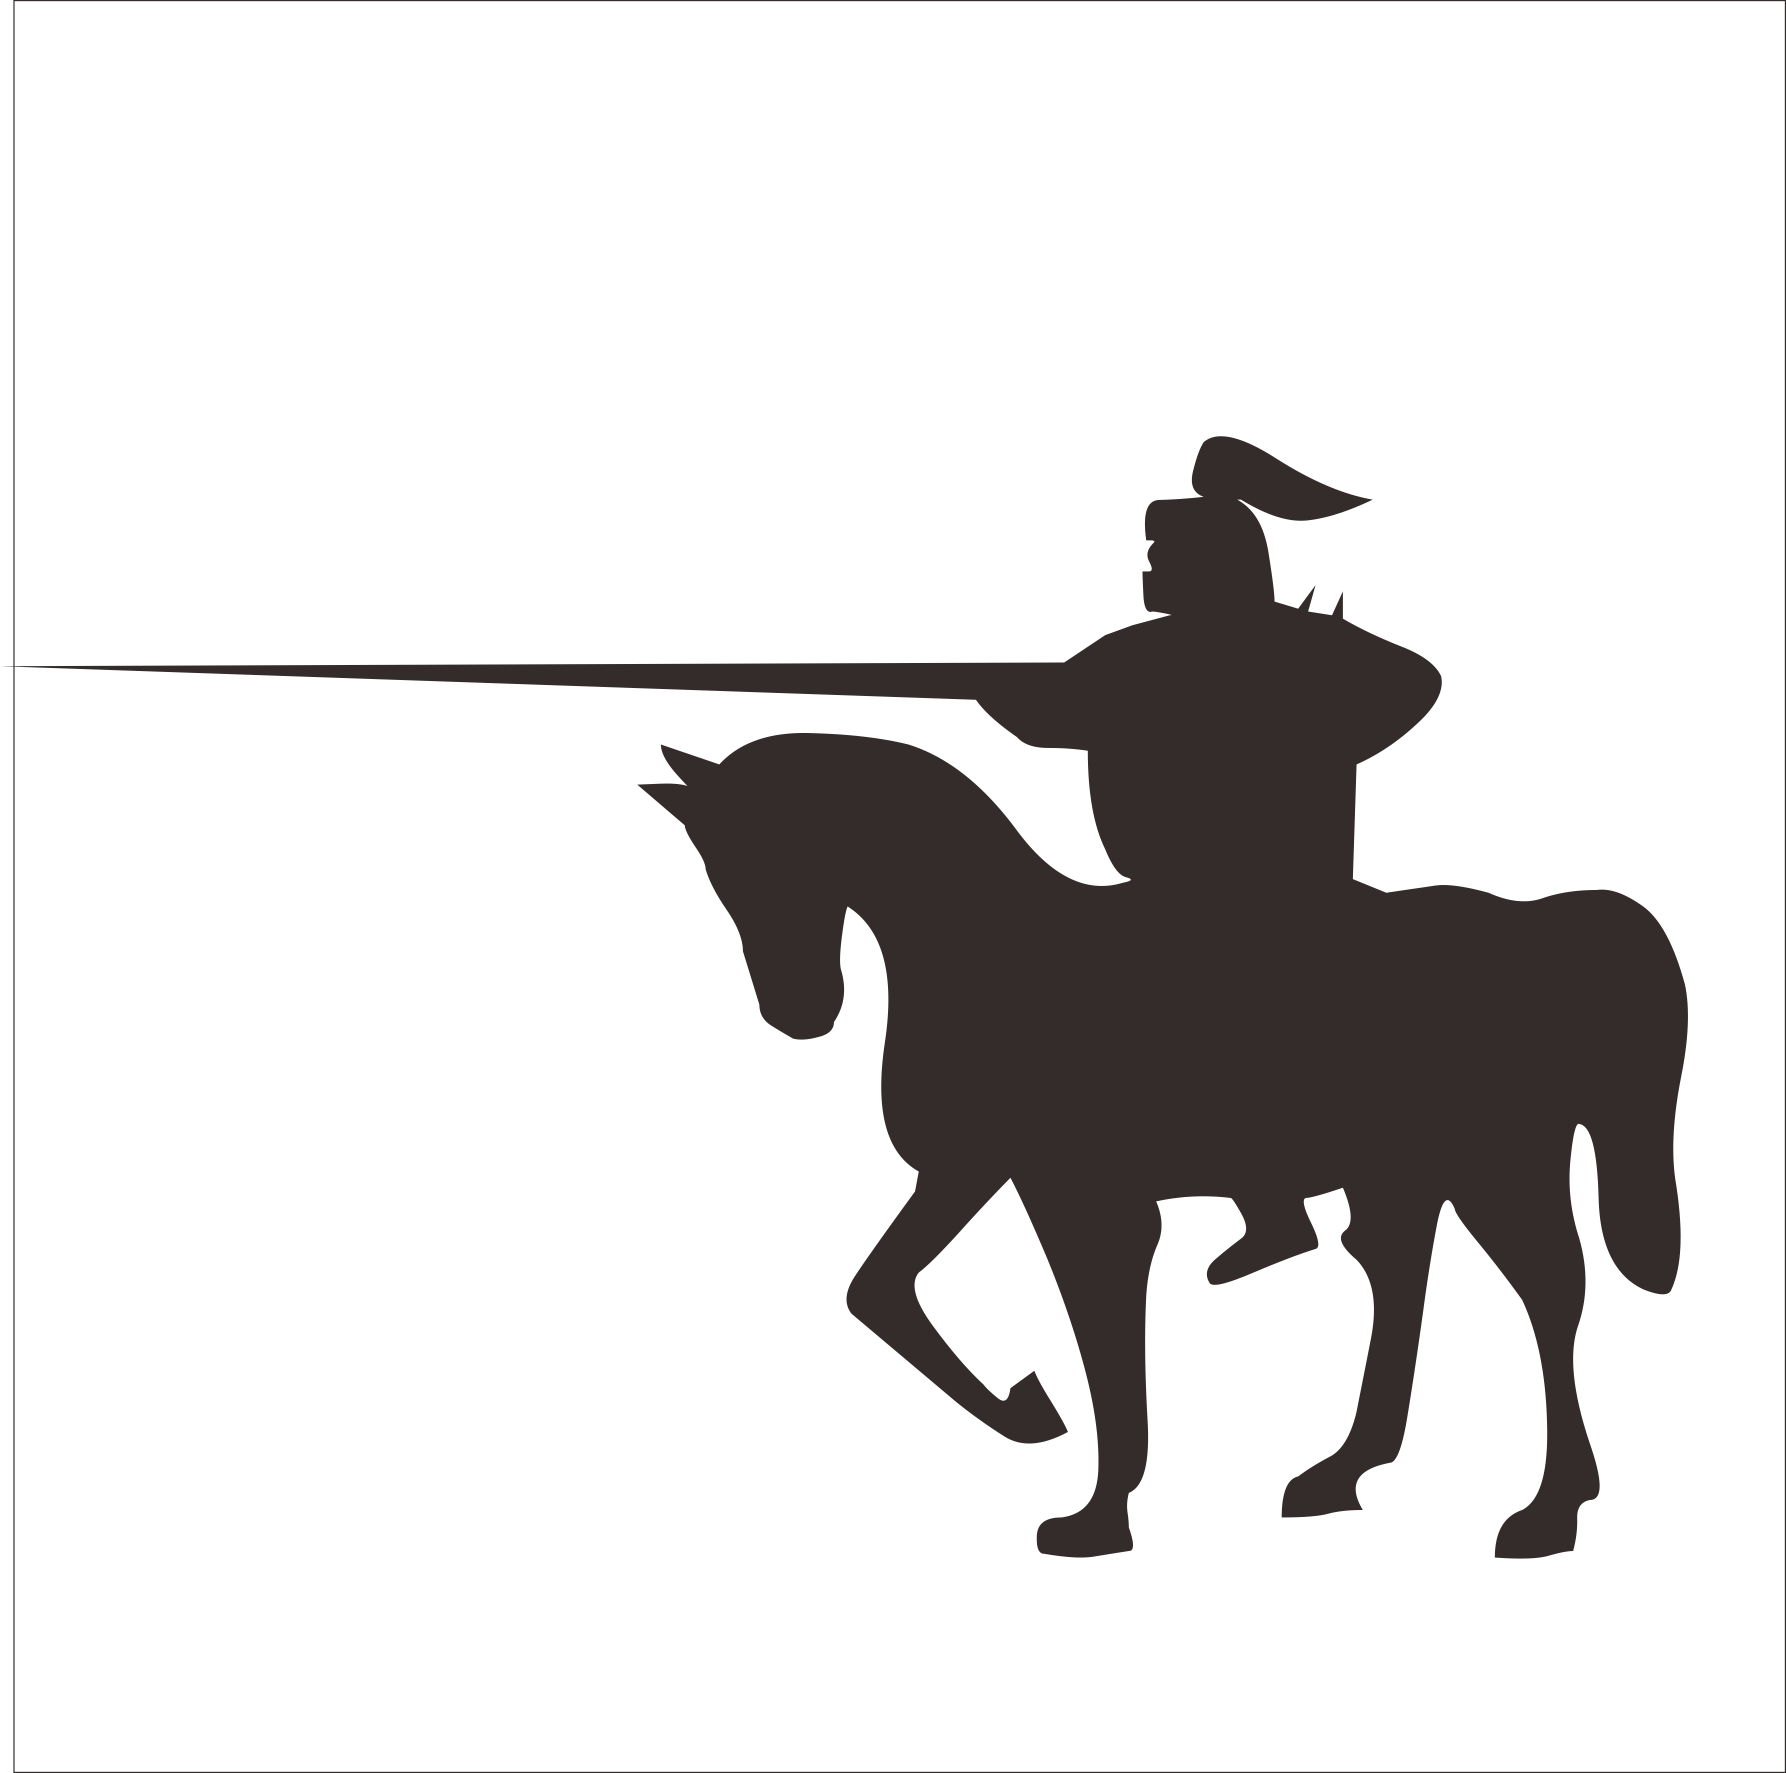 Horse central asian shepherd. Clipart dogs cowboy